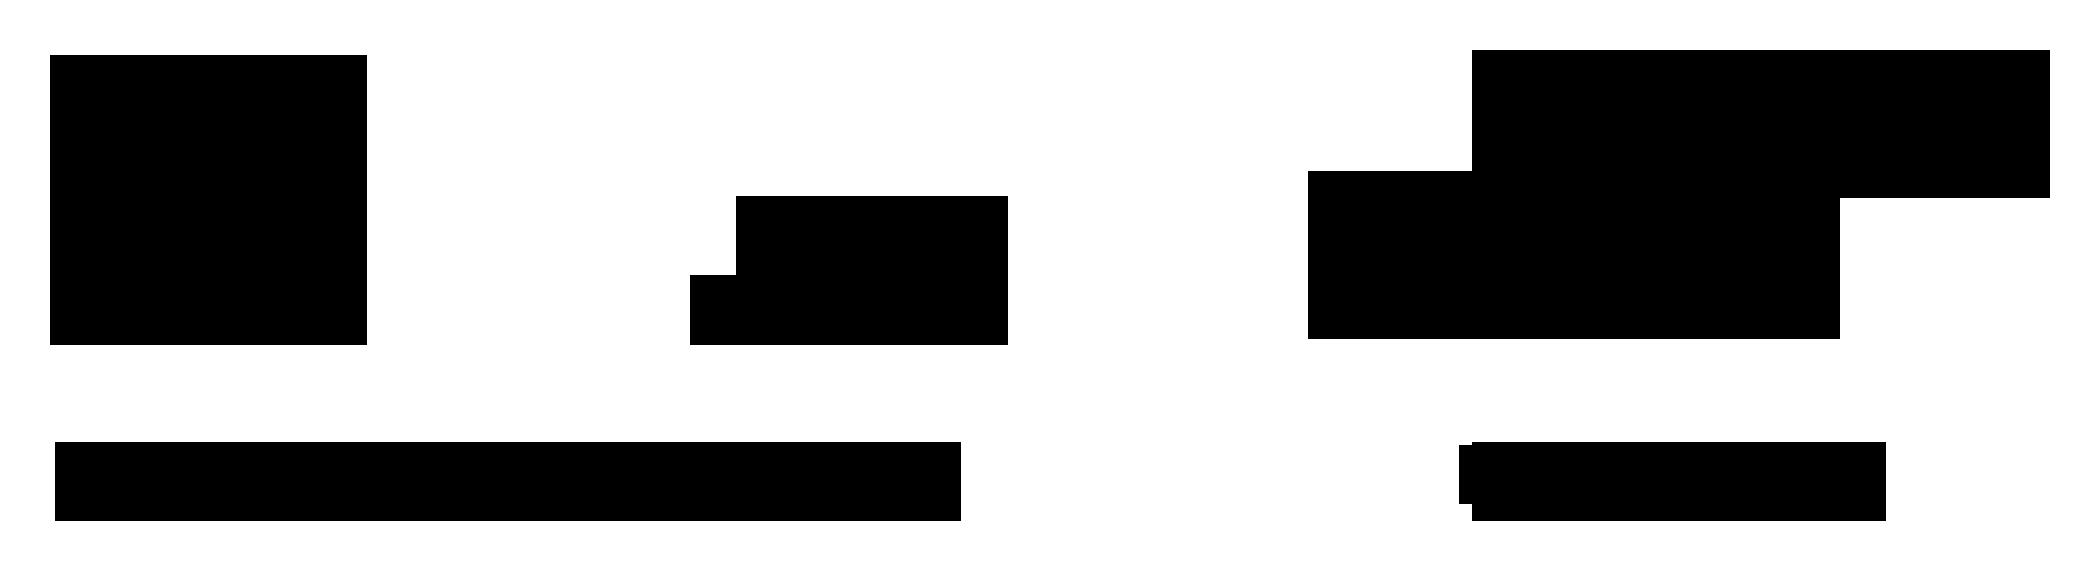 E-Z Nomenclature 1